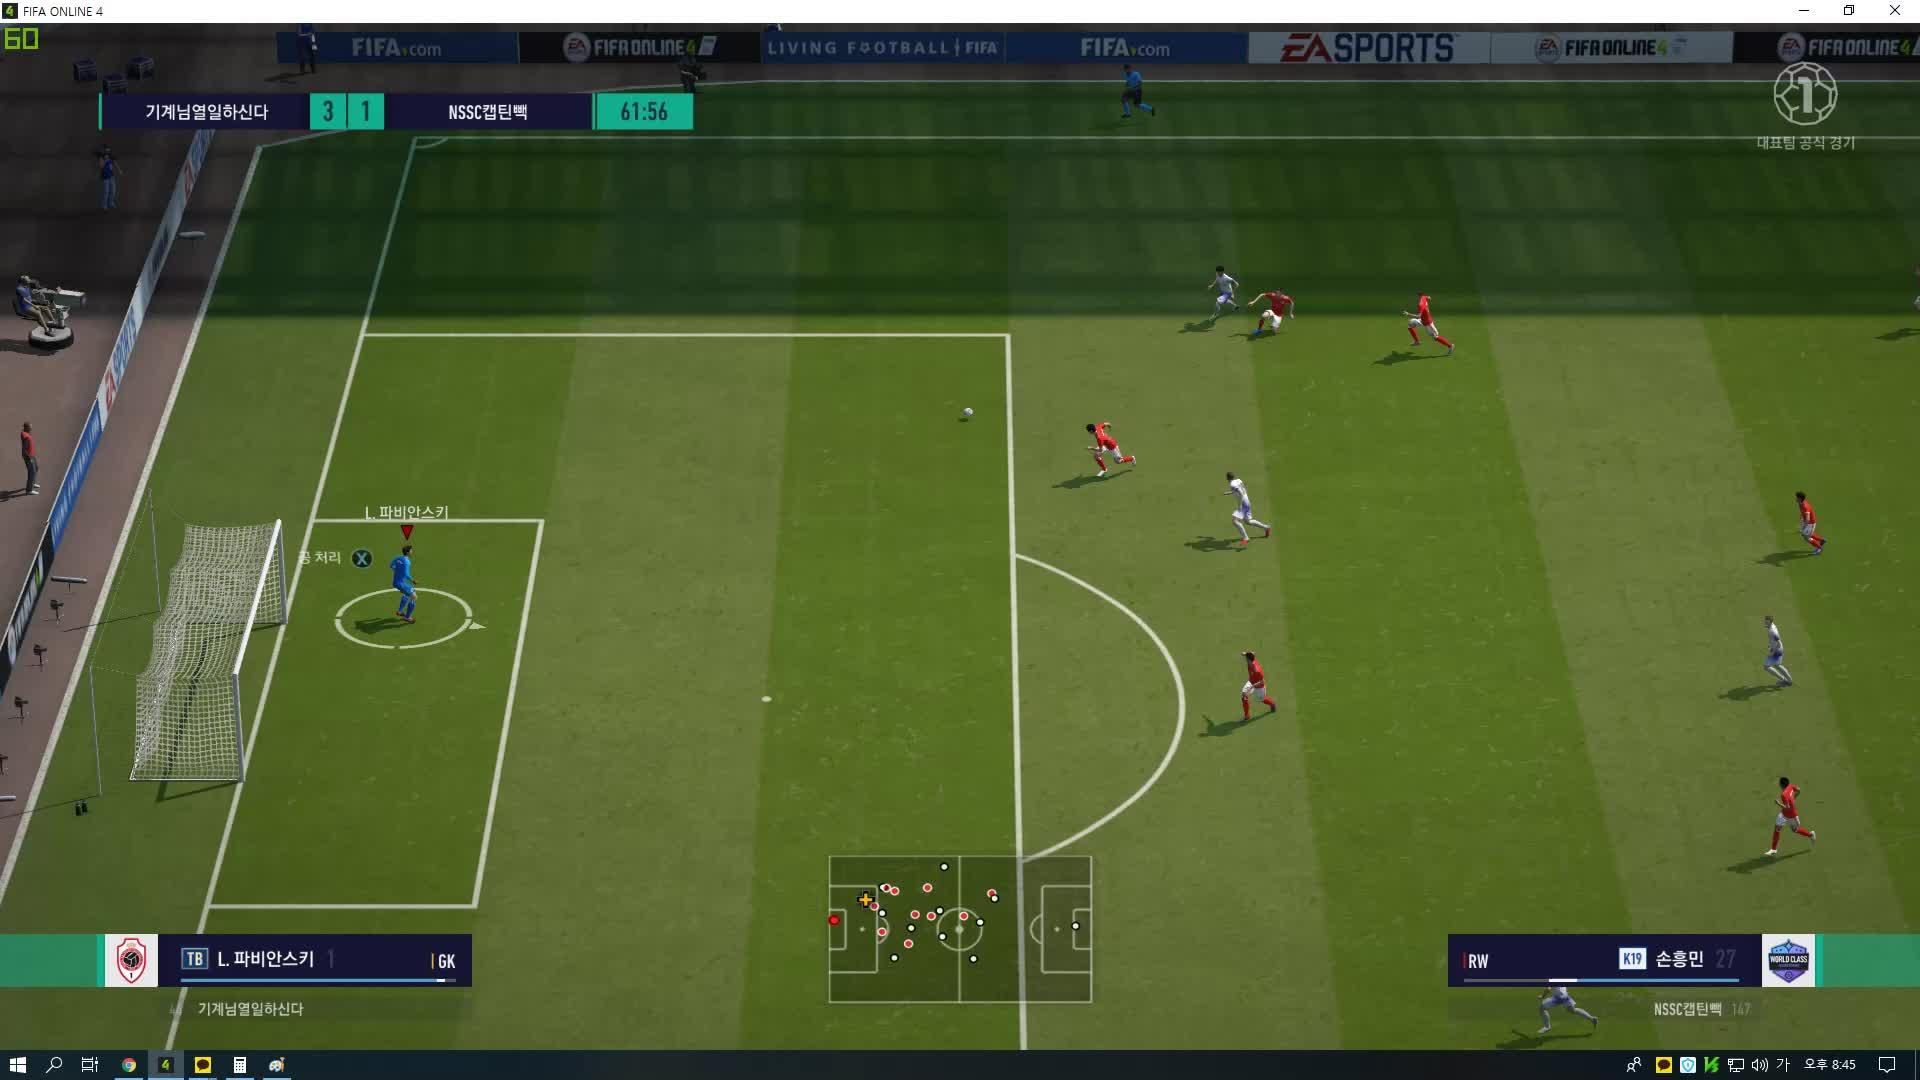 fifa, FIFA Online 4 2019.04.22 - 20.45.17.08.DVR GIFs